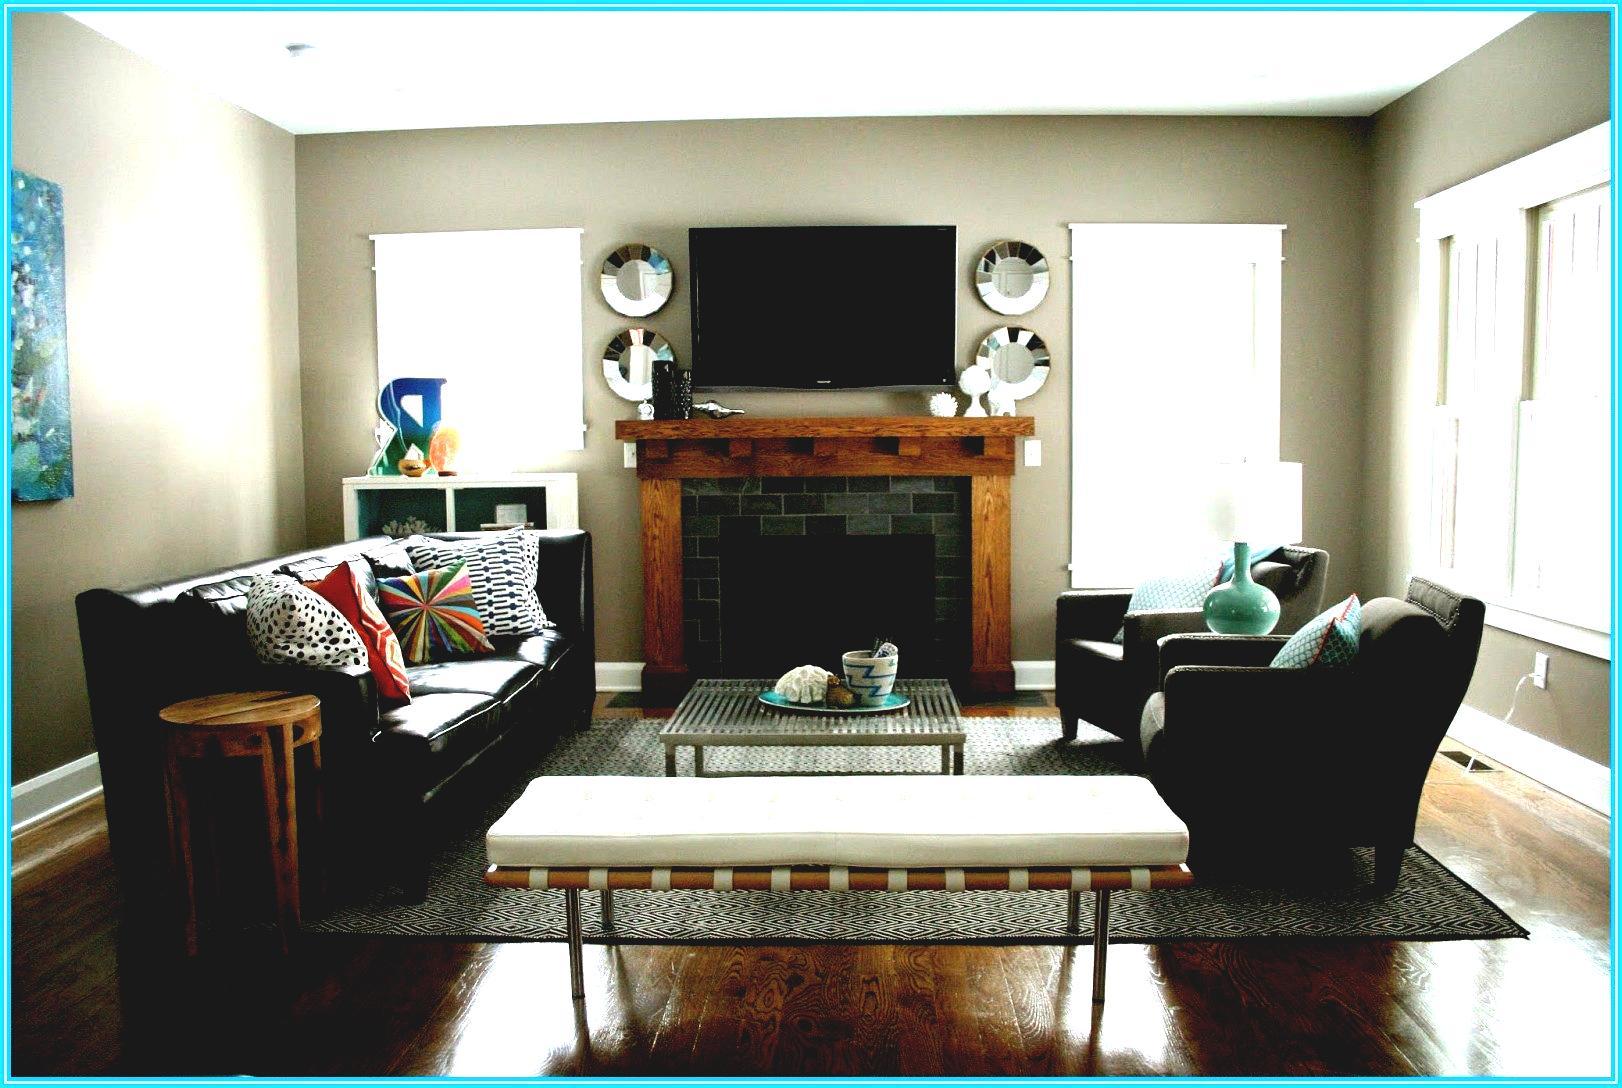 Tv over a fireplace.  Source: blueridgeparkwaymarathon.com